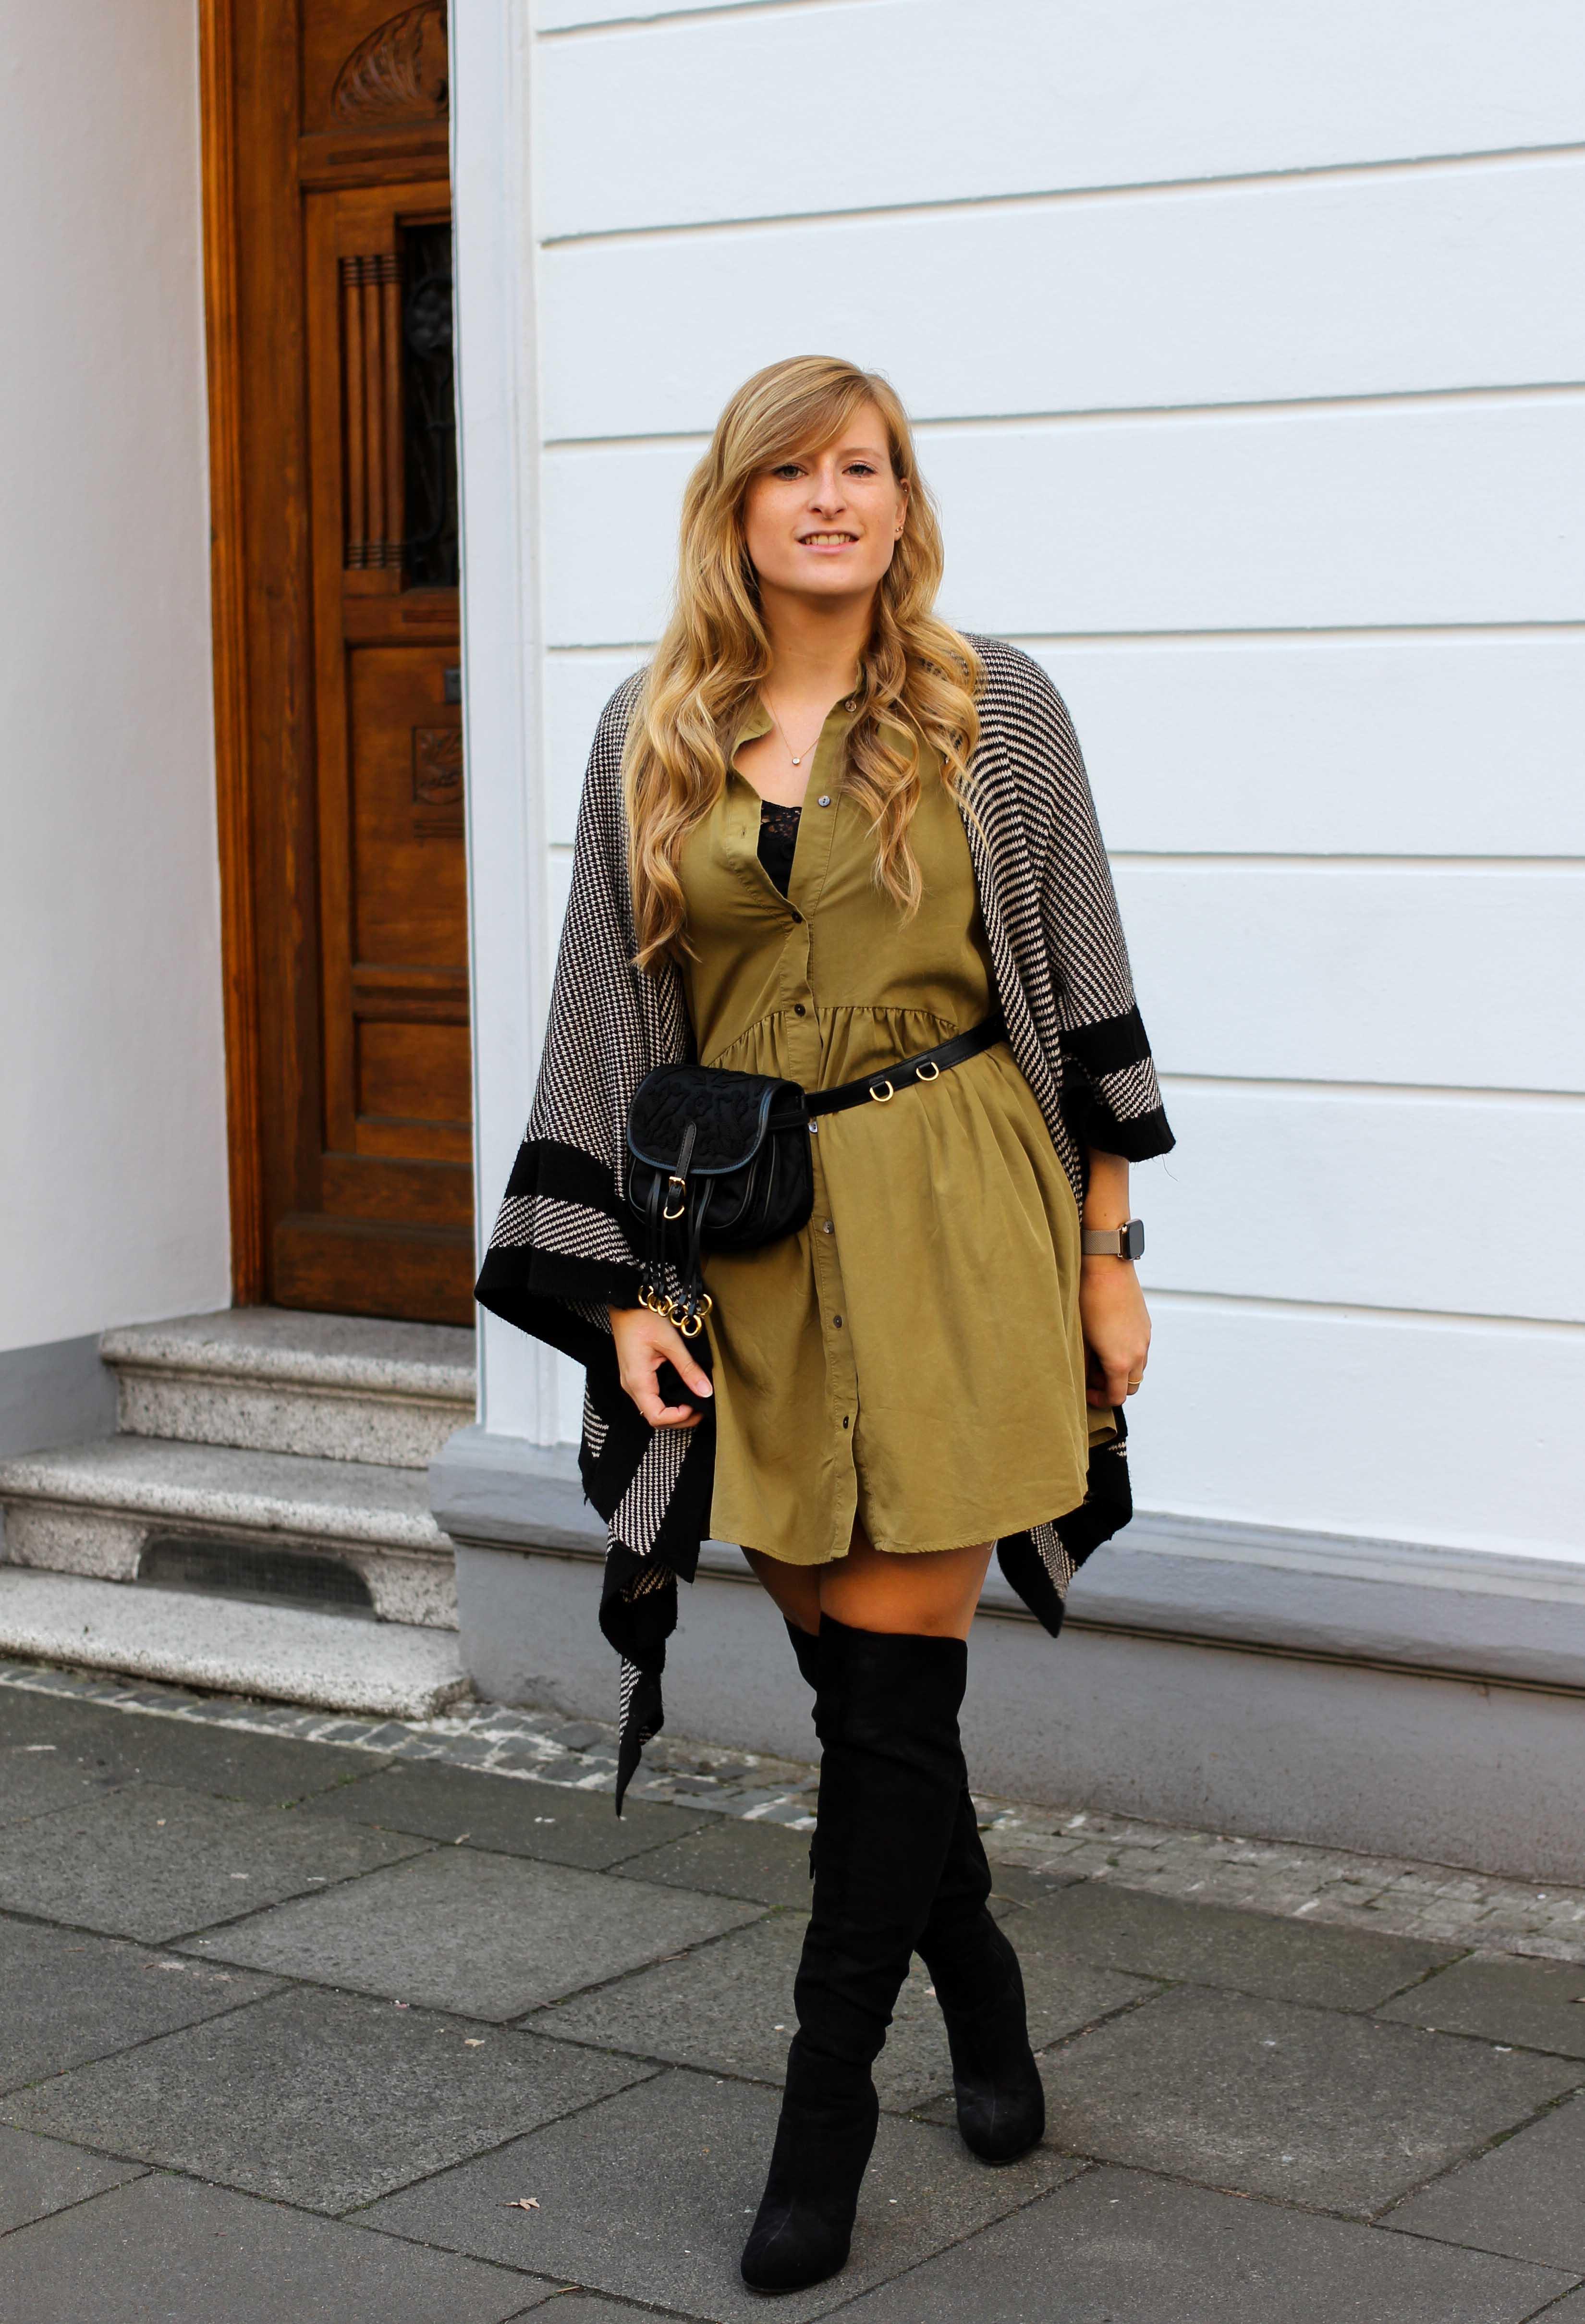 Overknees Gürteltasche Prada Poncho Second-Hand Kleidung kombinieren Streetstyle Outfit Bonn Zara Kleid grün Frühling 2019 8